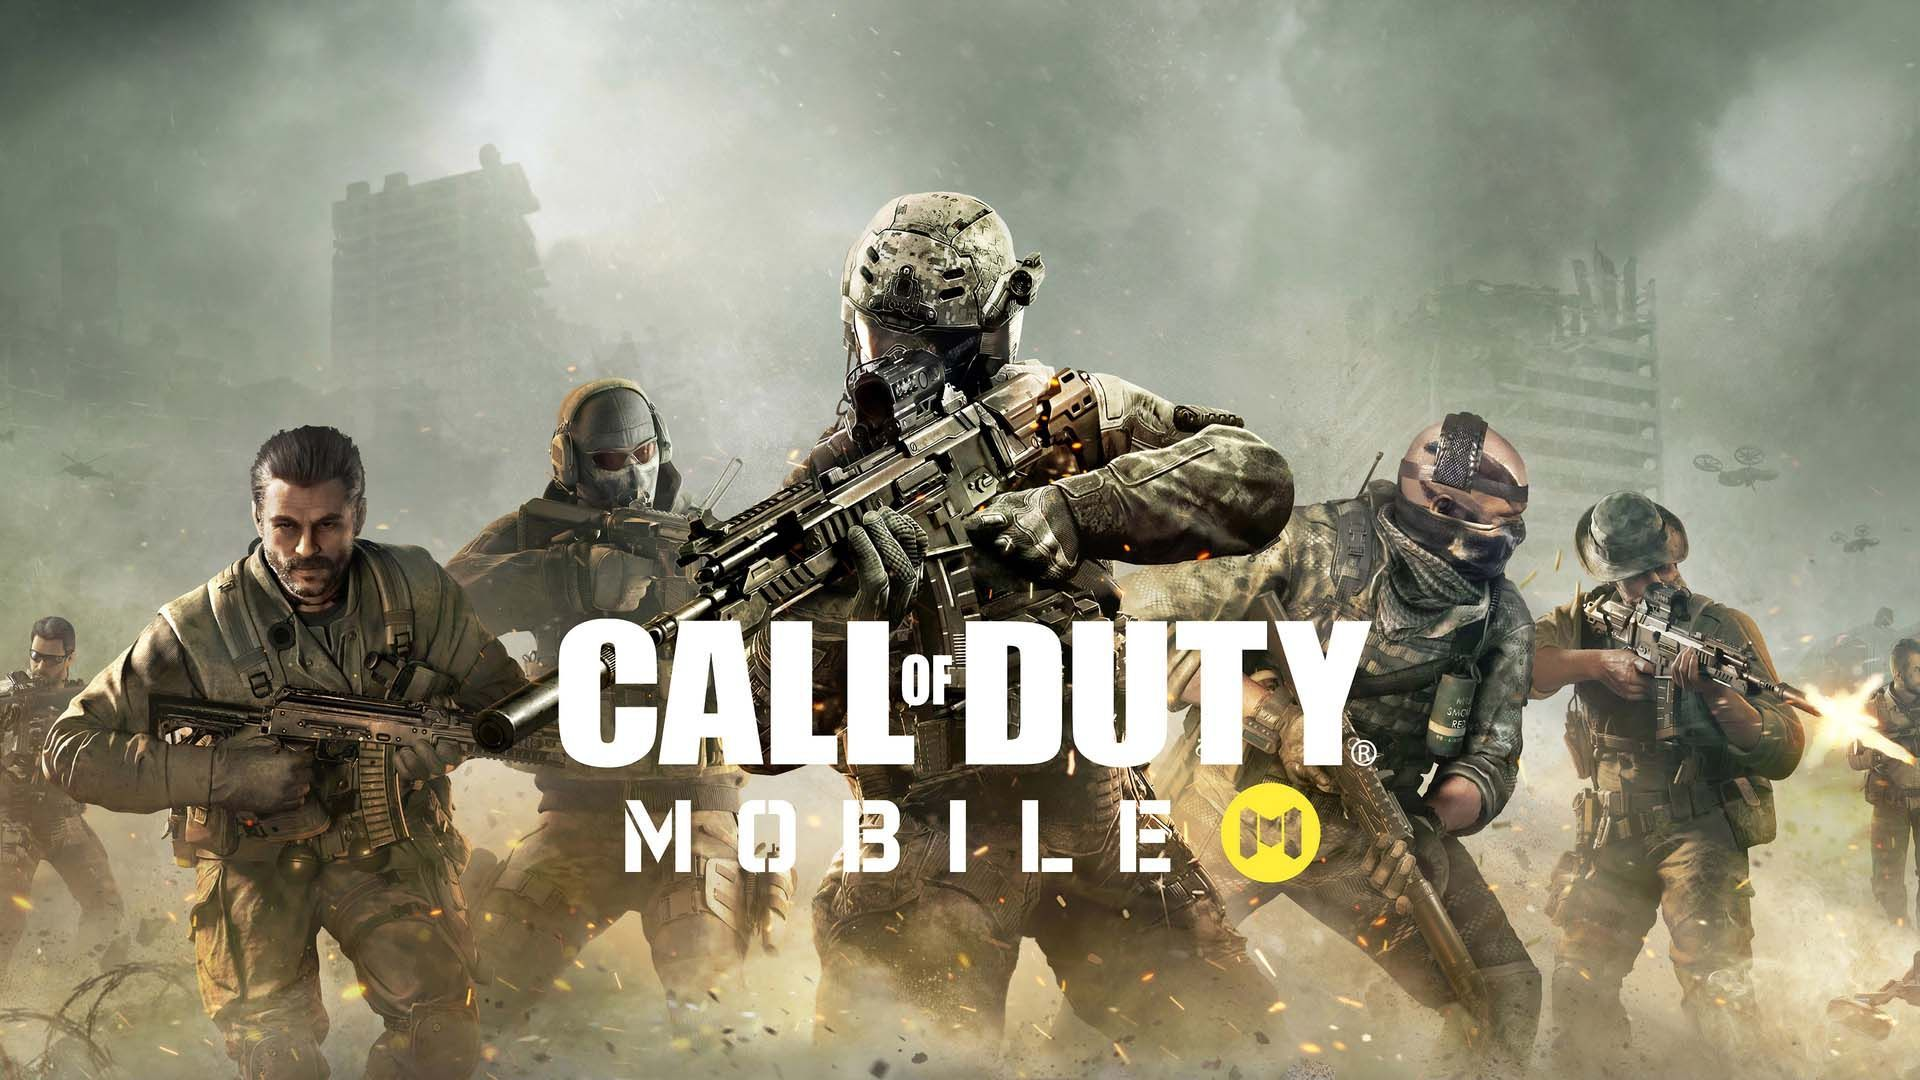 يمكنك الآن لعب Call Of Duty Mobile على الحاسب الشخصى   Mobile game, Game  cheats, Call of duty